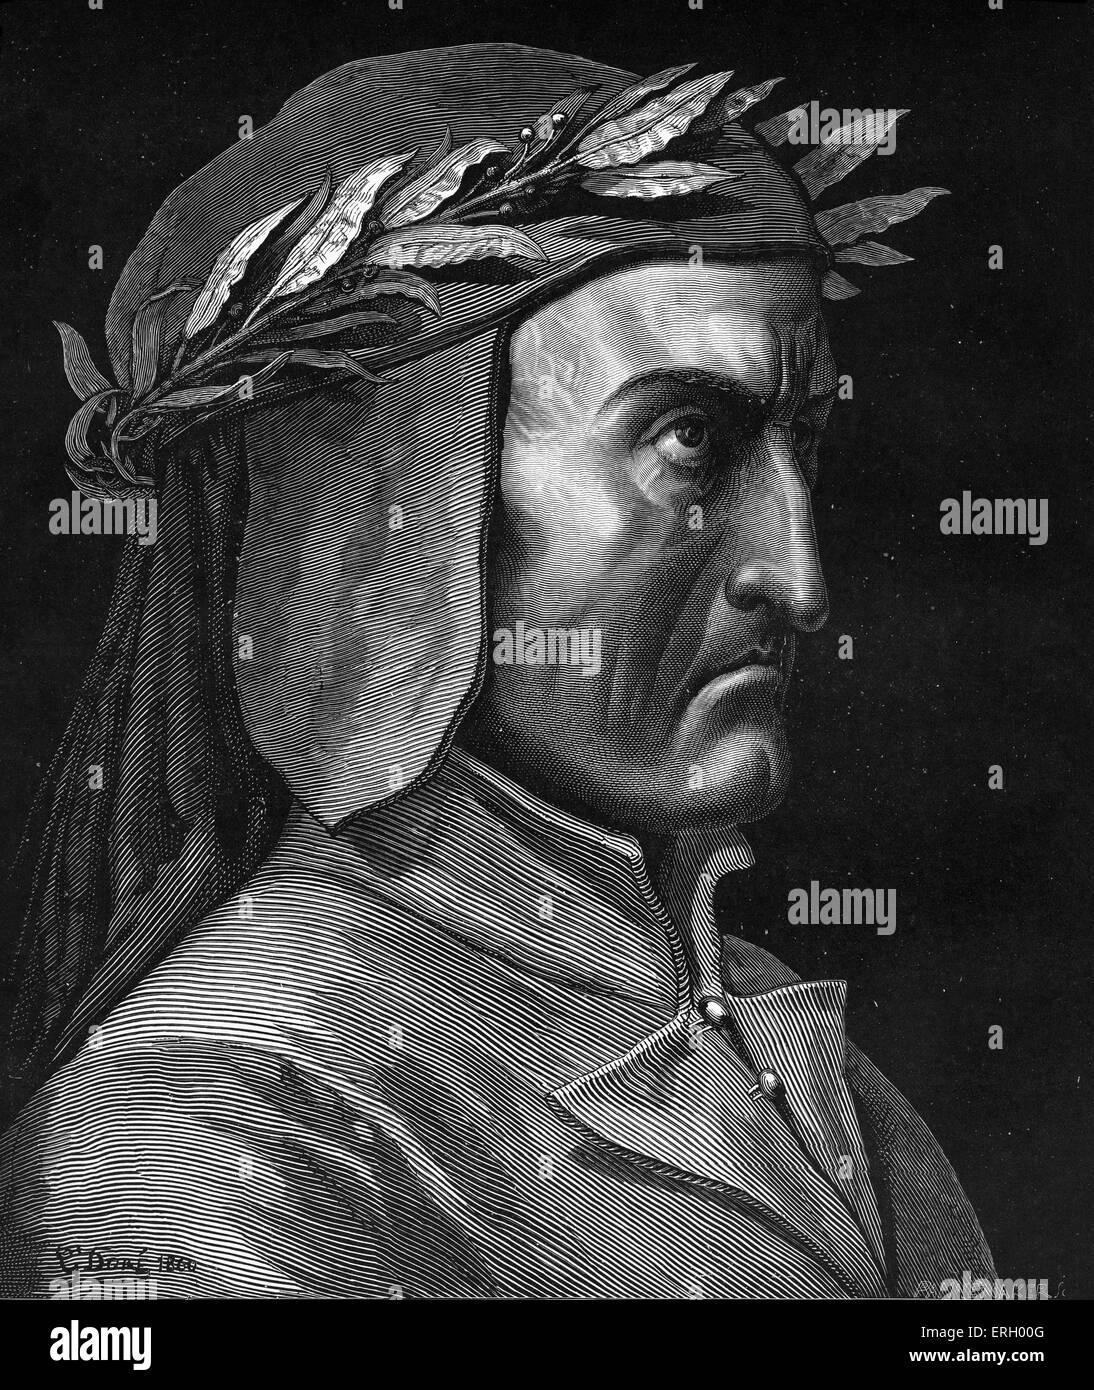 Dante Alighieri, profile portrait with laurel wreath.  Italian poet, 1265-1321. - Stock Image